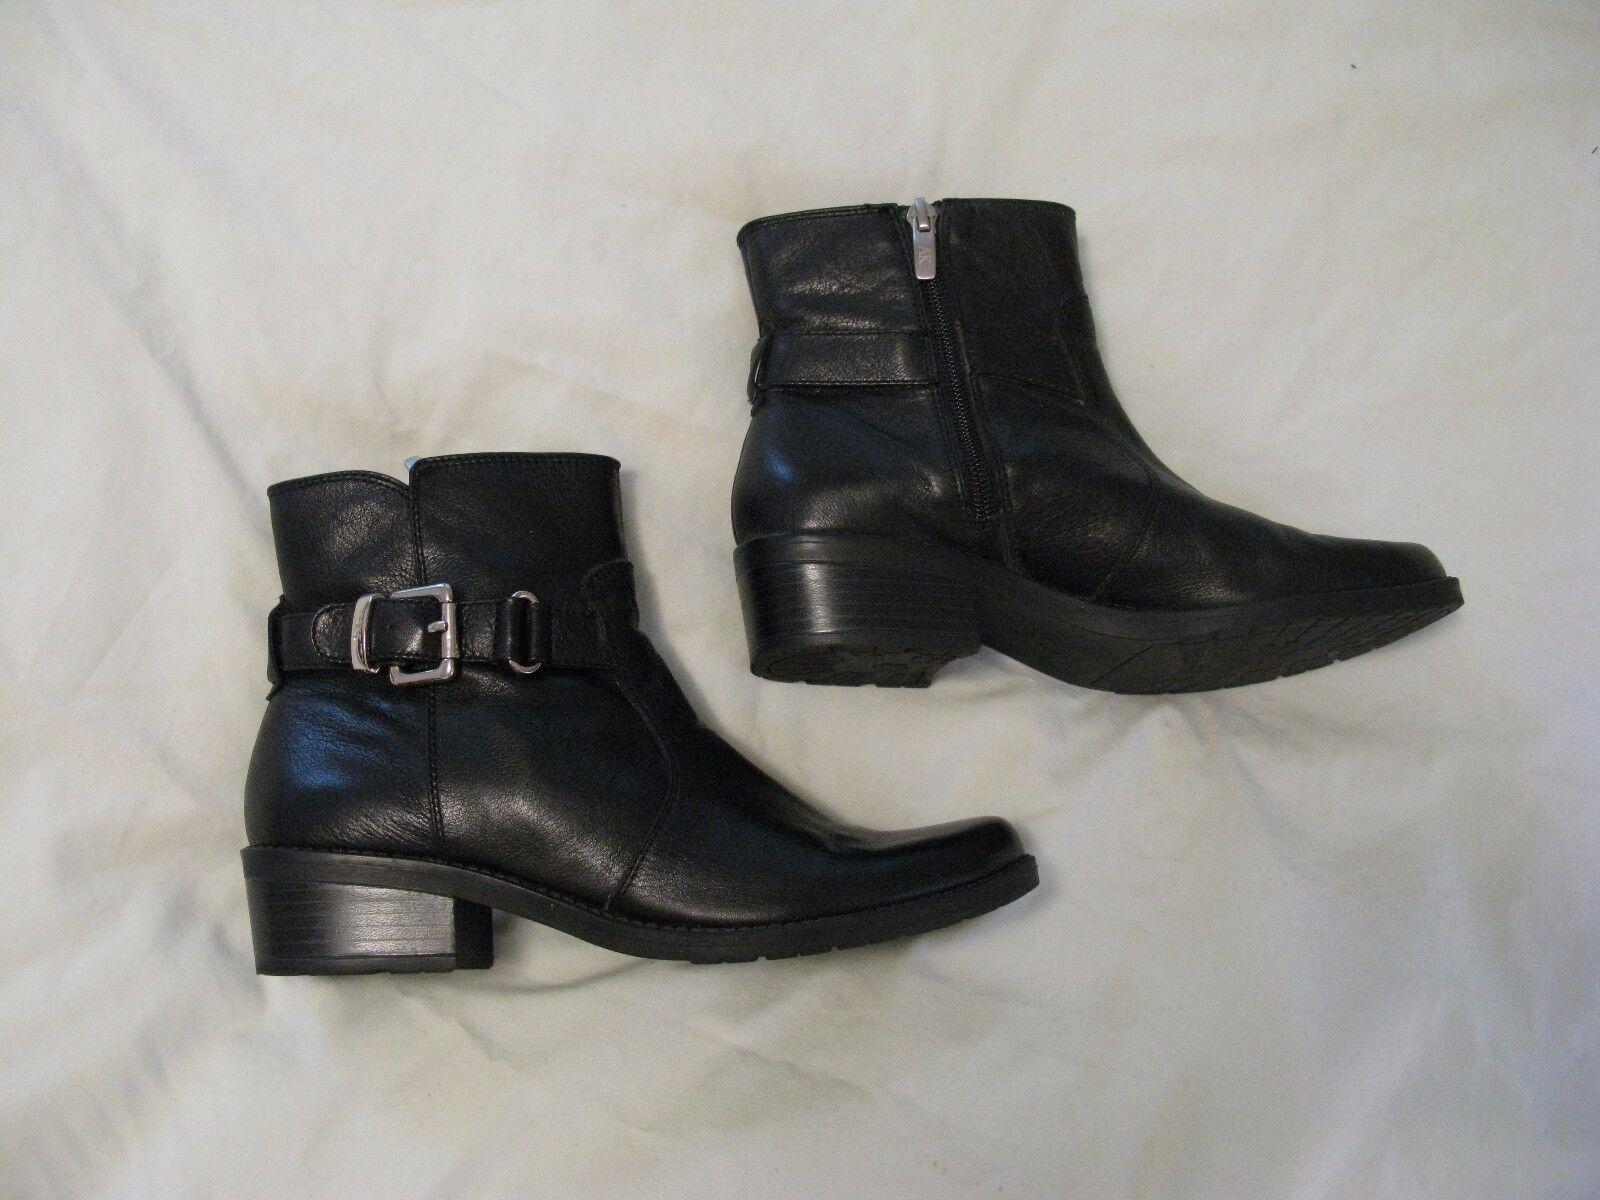 Anne Klein 'Liana' Ankle Boot Sz 7 M Black Leather - Gorgeous Style! Rare & HTF